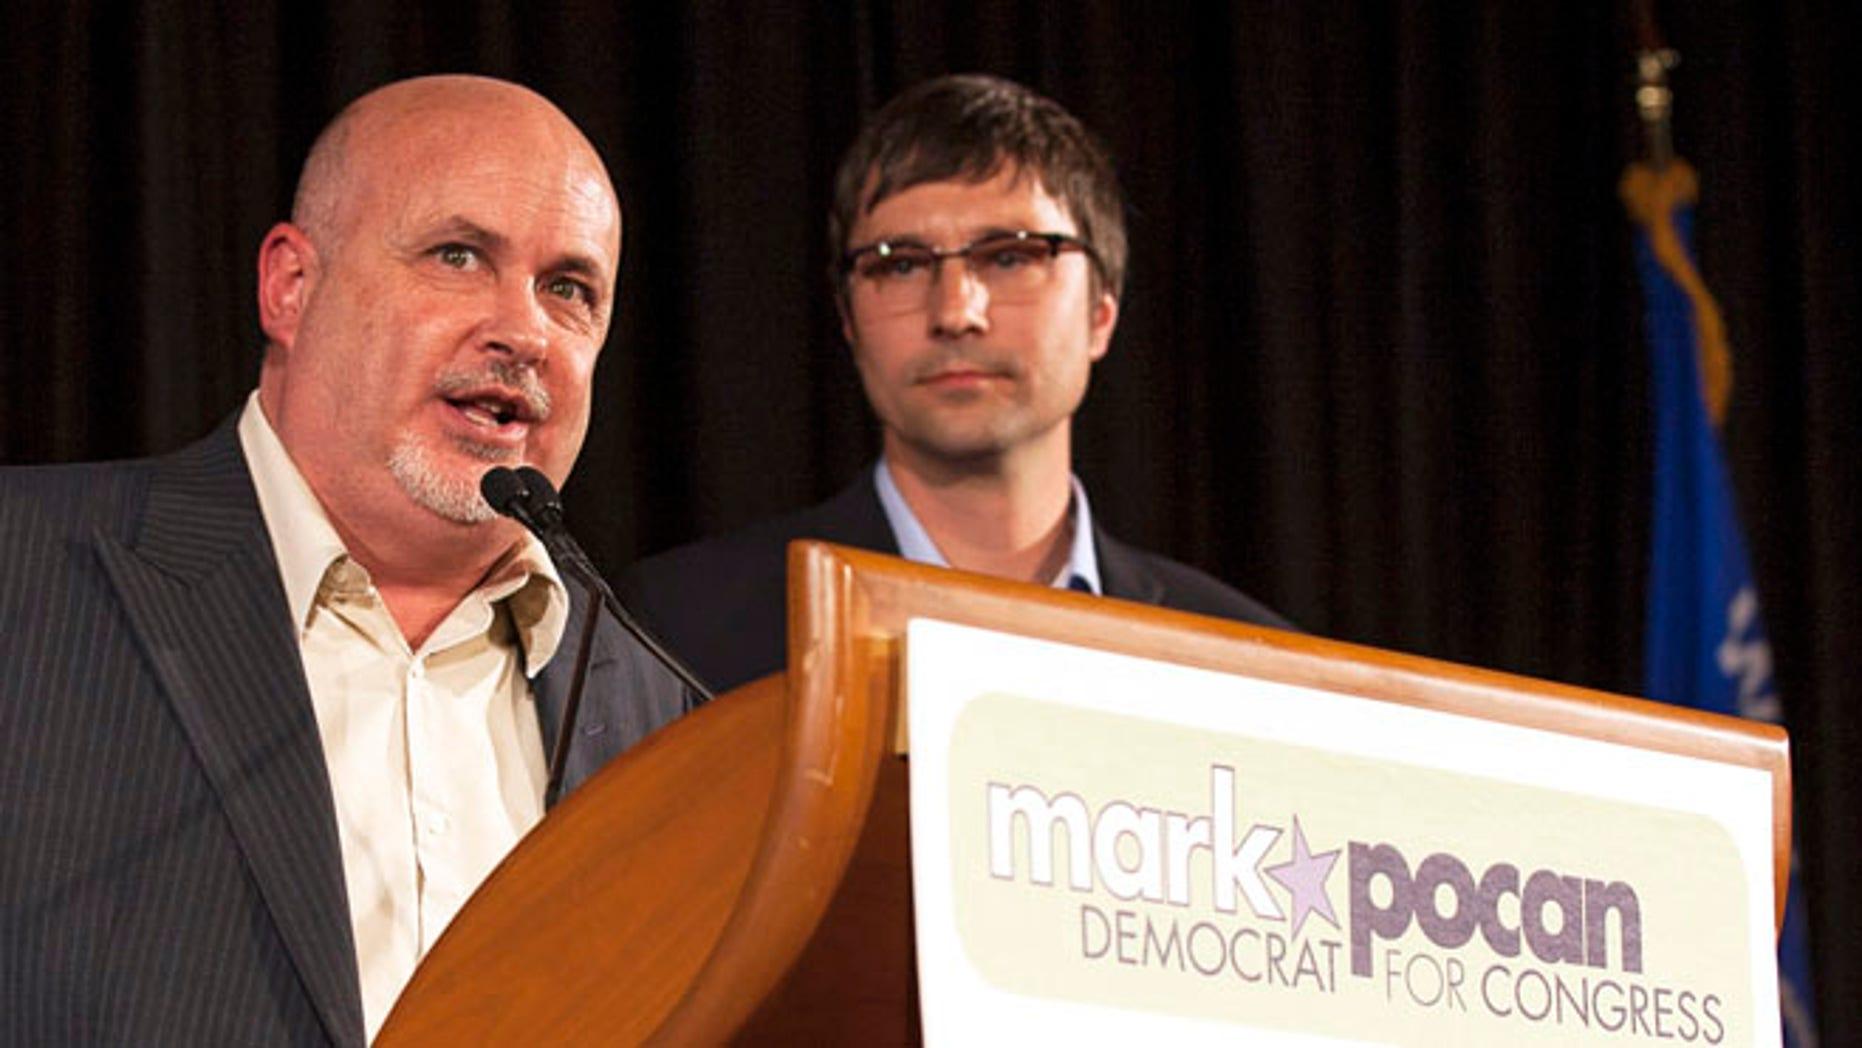 Nov. 6, 2012: Mark Pocan, D-Wisc., alongside his husband, Philip Frank in Madison, Wisconsin.